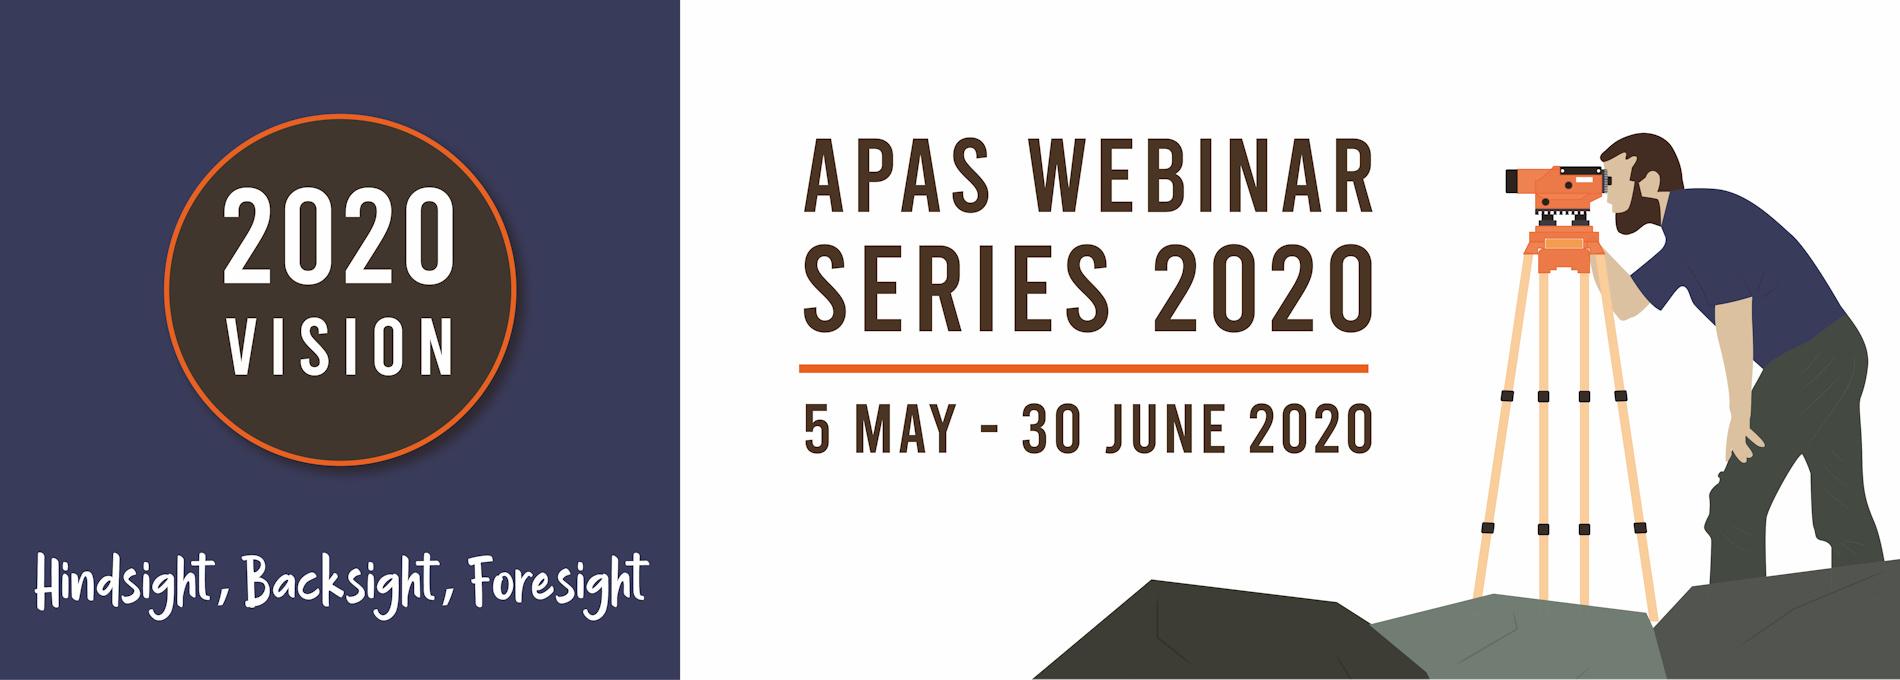 APAS2020 Webinar Series